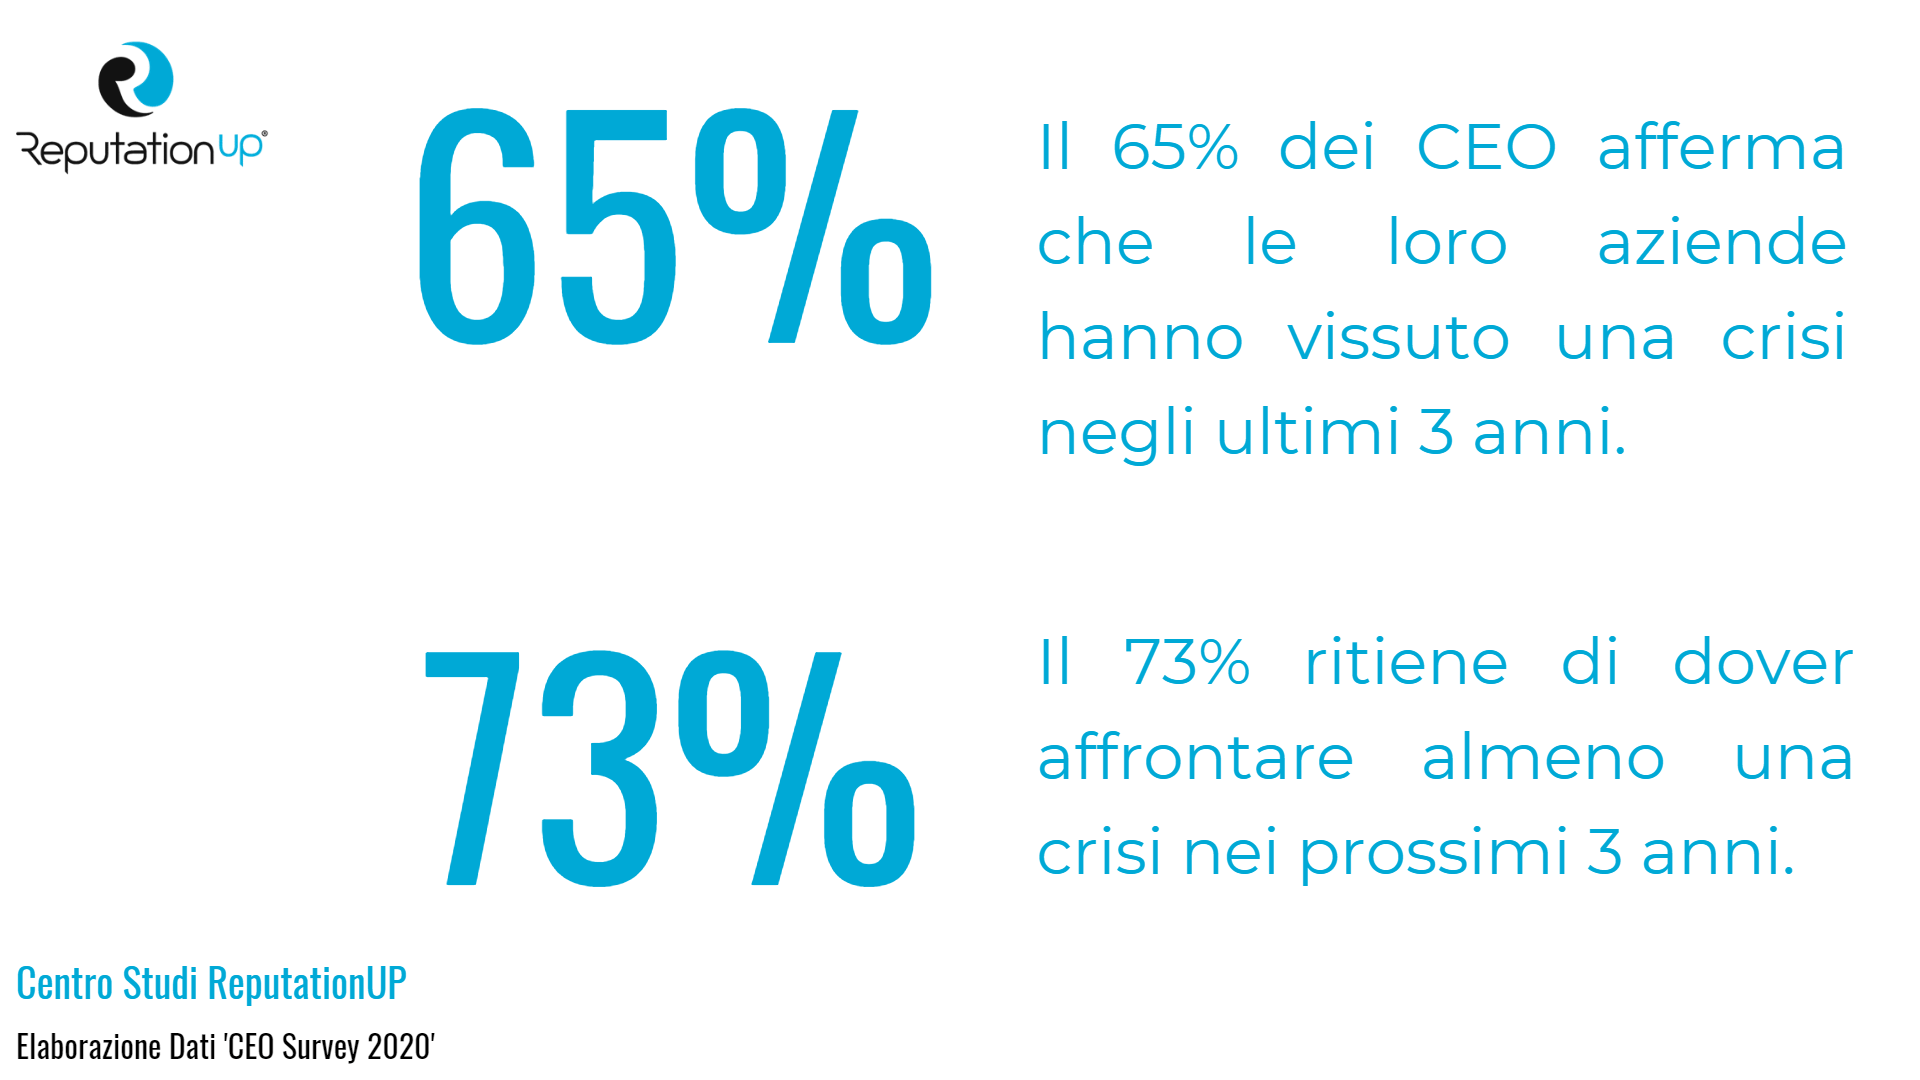 statistiche crisis management 2020 centro studi reputationup